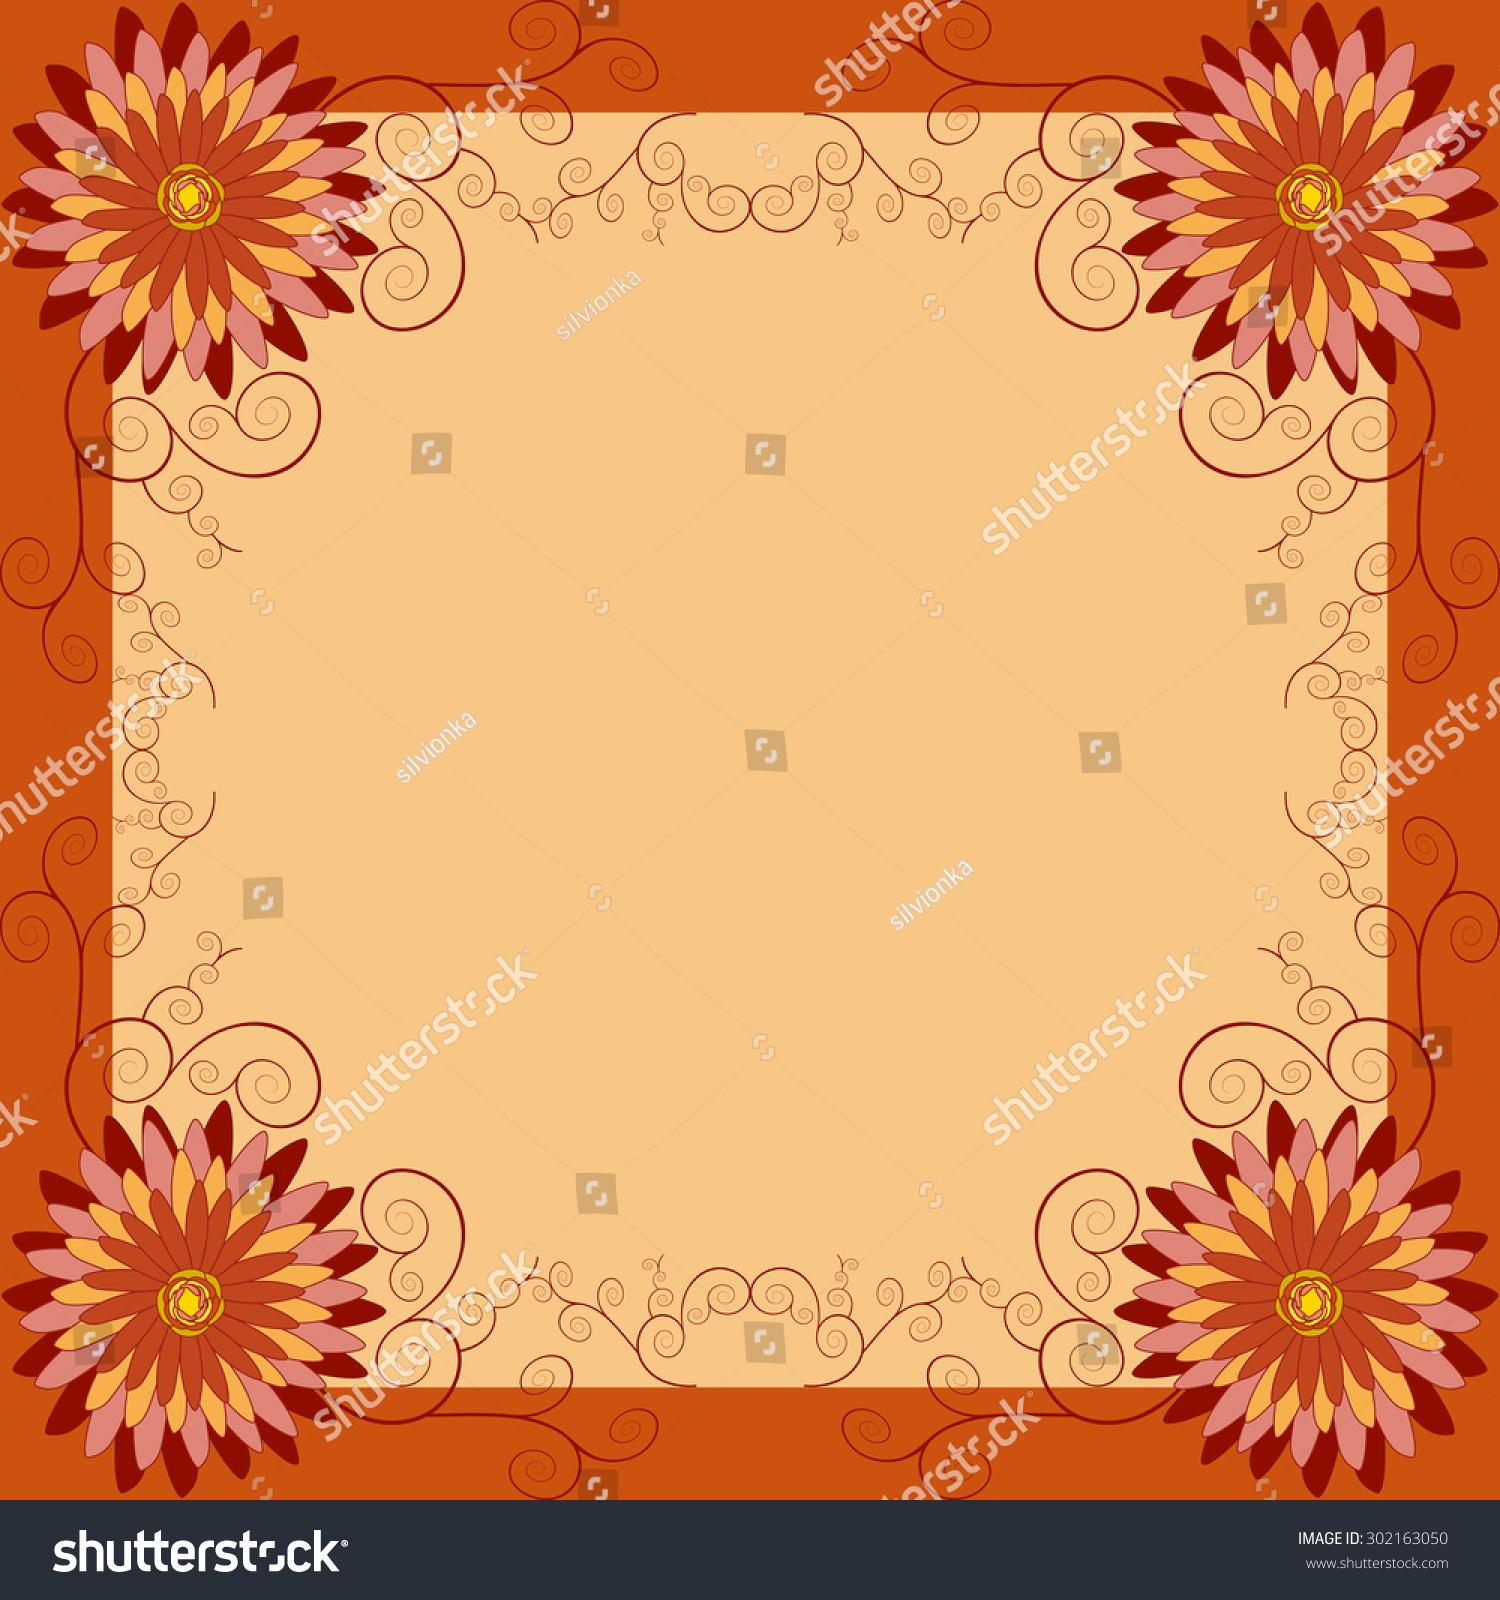 Background Orange Red Yellow Flower Chrysanthemum Stock Vector